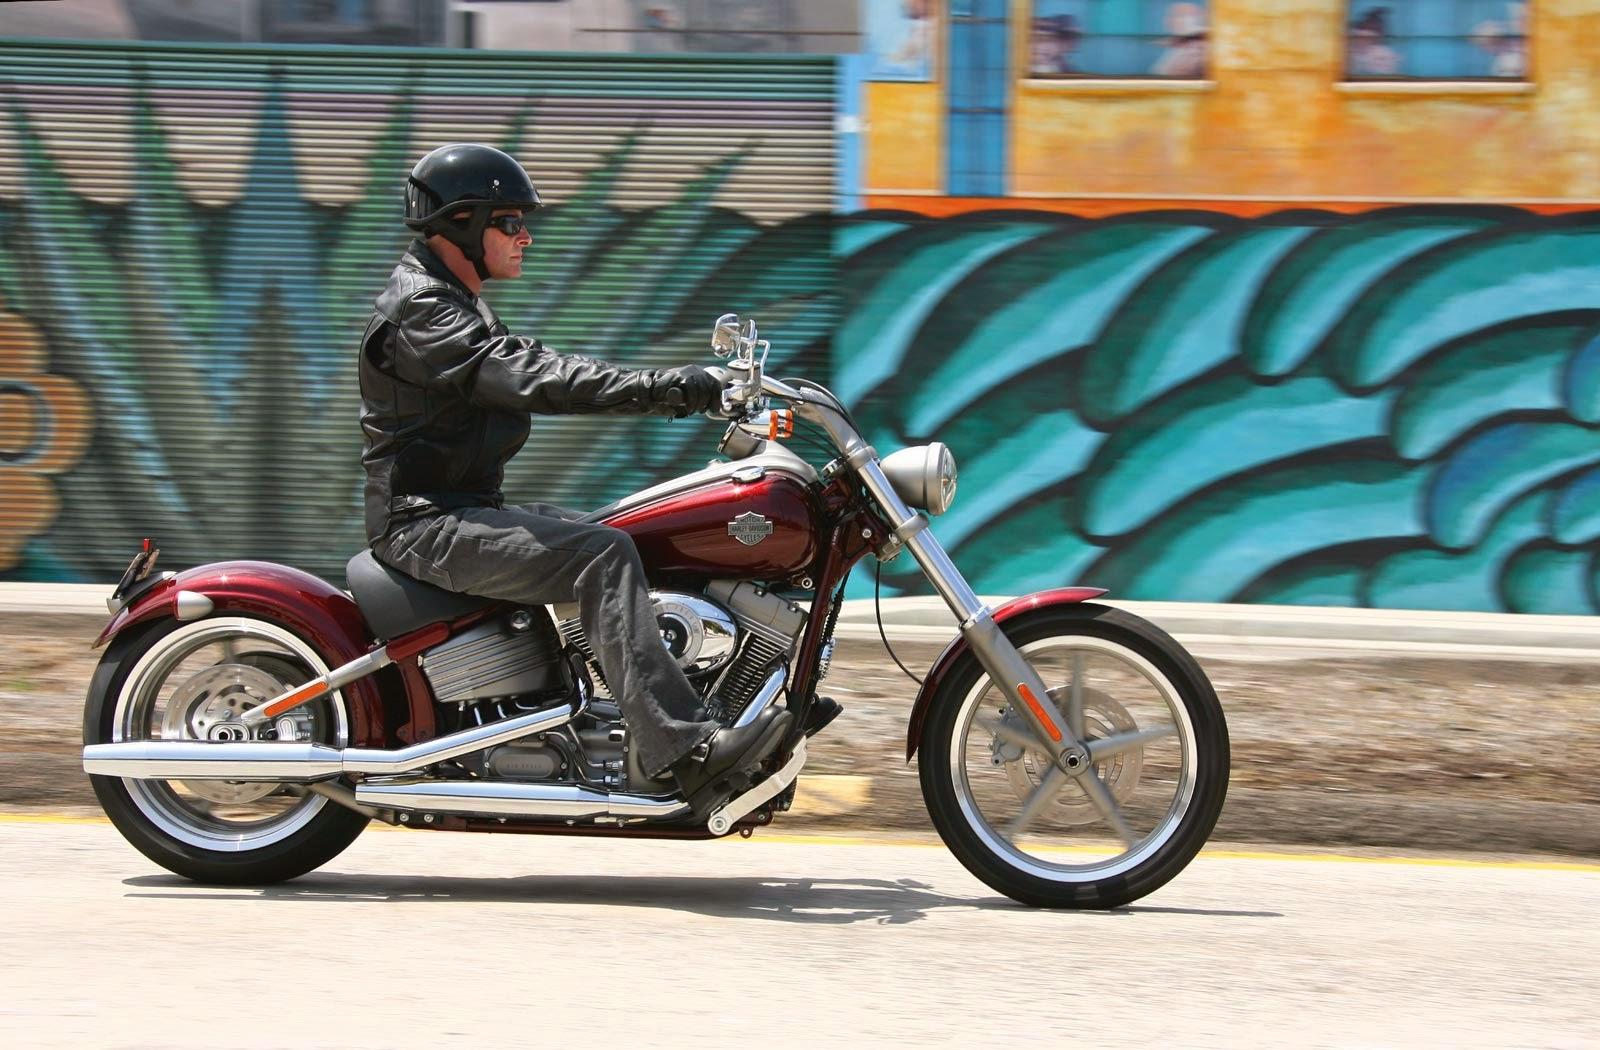 Harley davidson softail service repair manual.